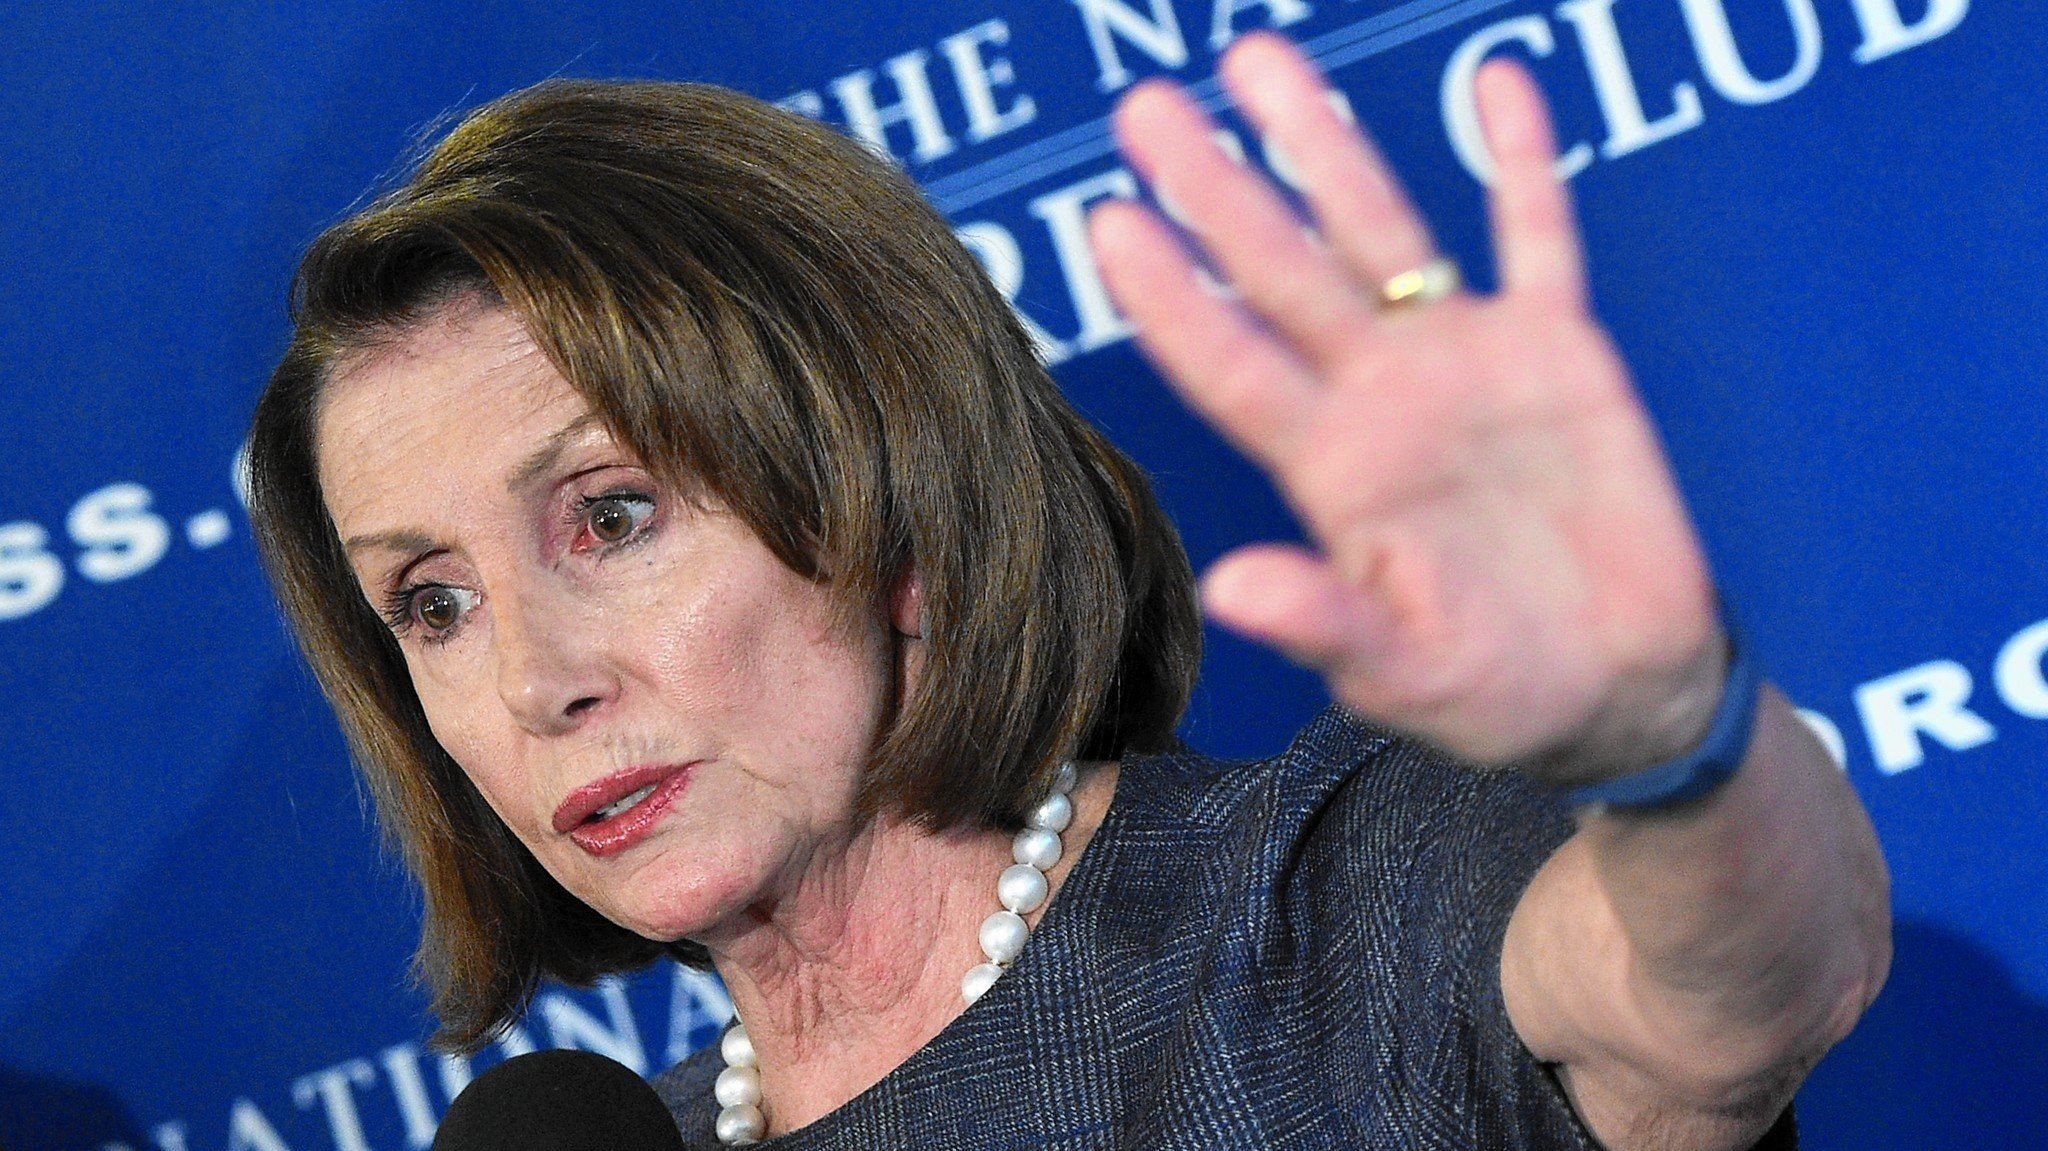 CA Poll Plurality Disapprove of Pelosi Job Performance